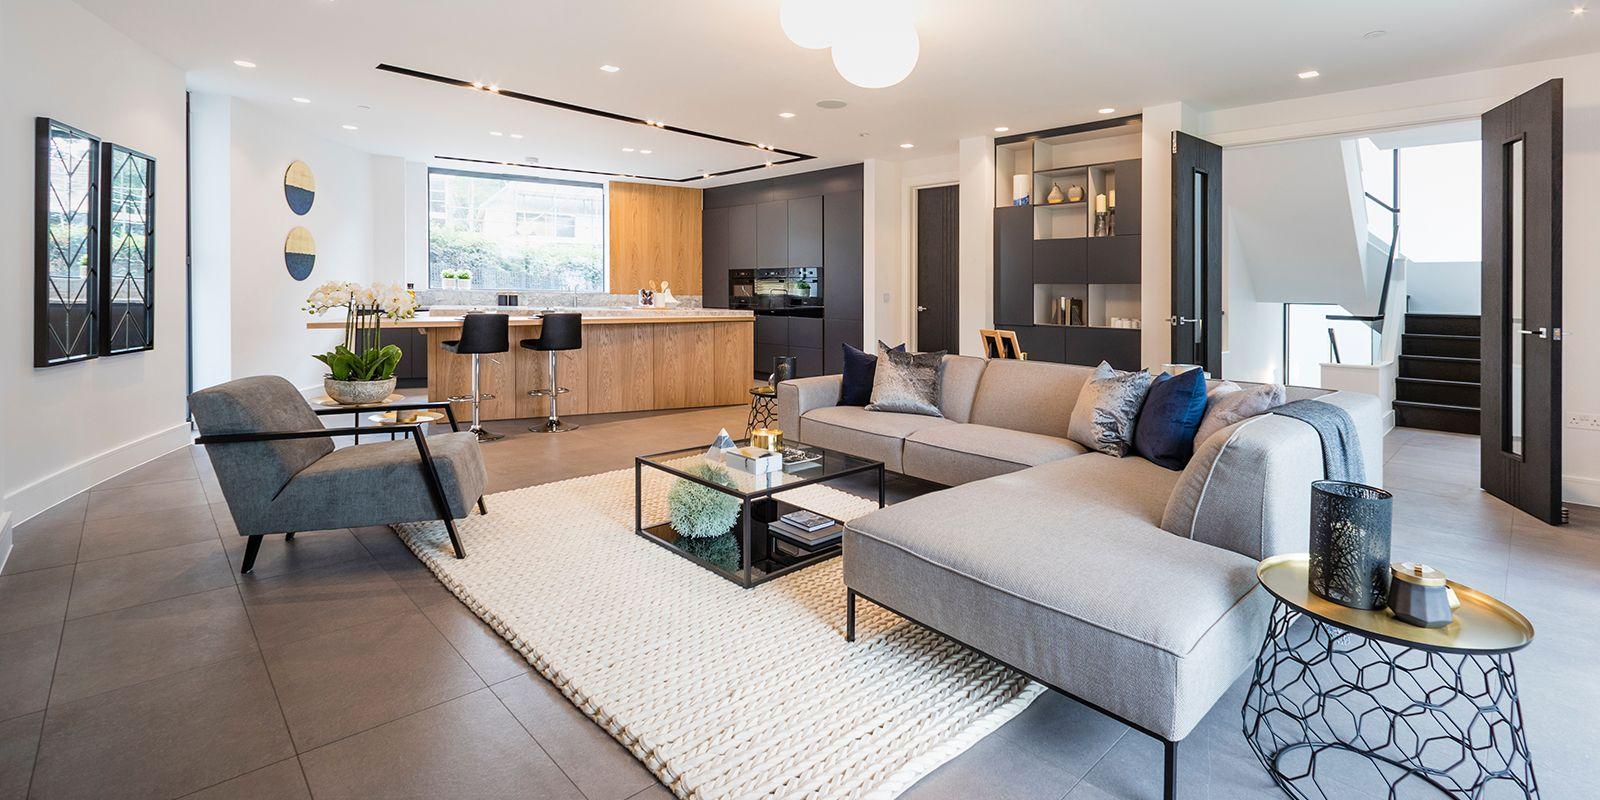 Argent Design Google Search Interior Design London Interior